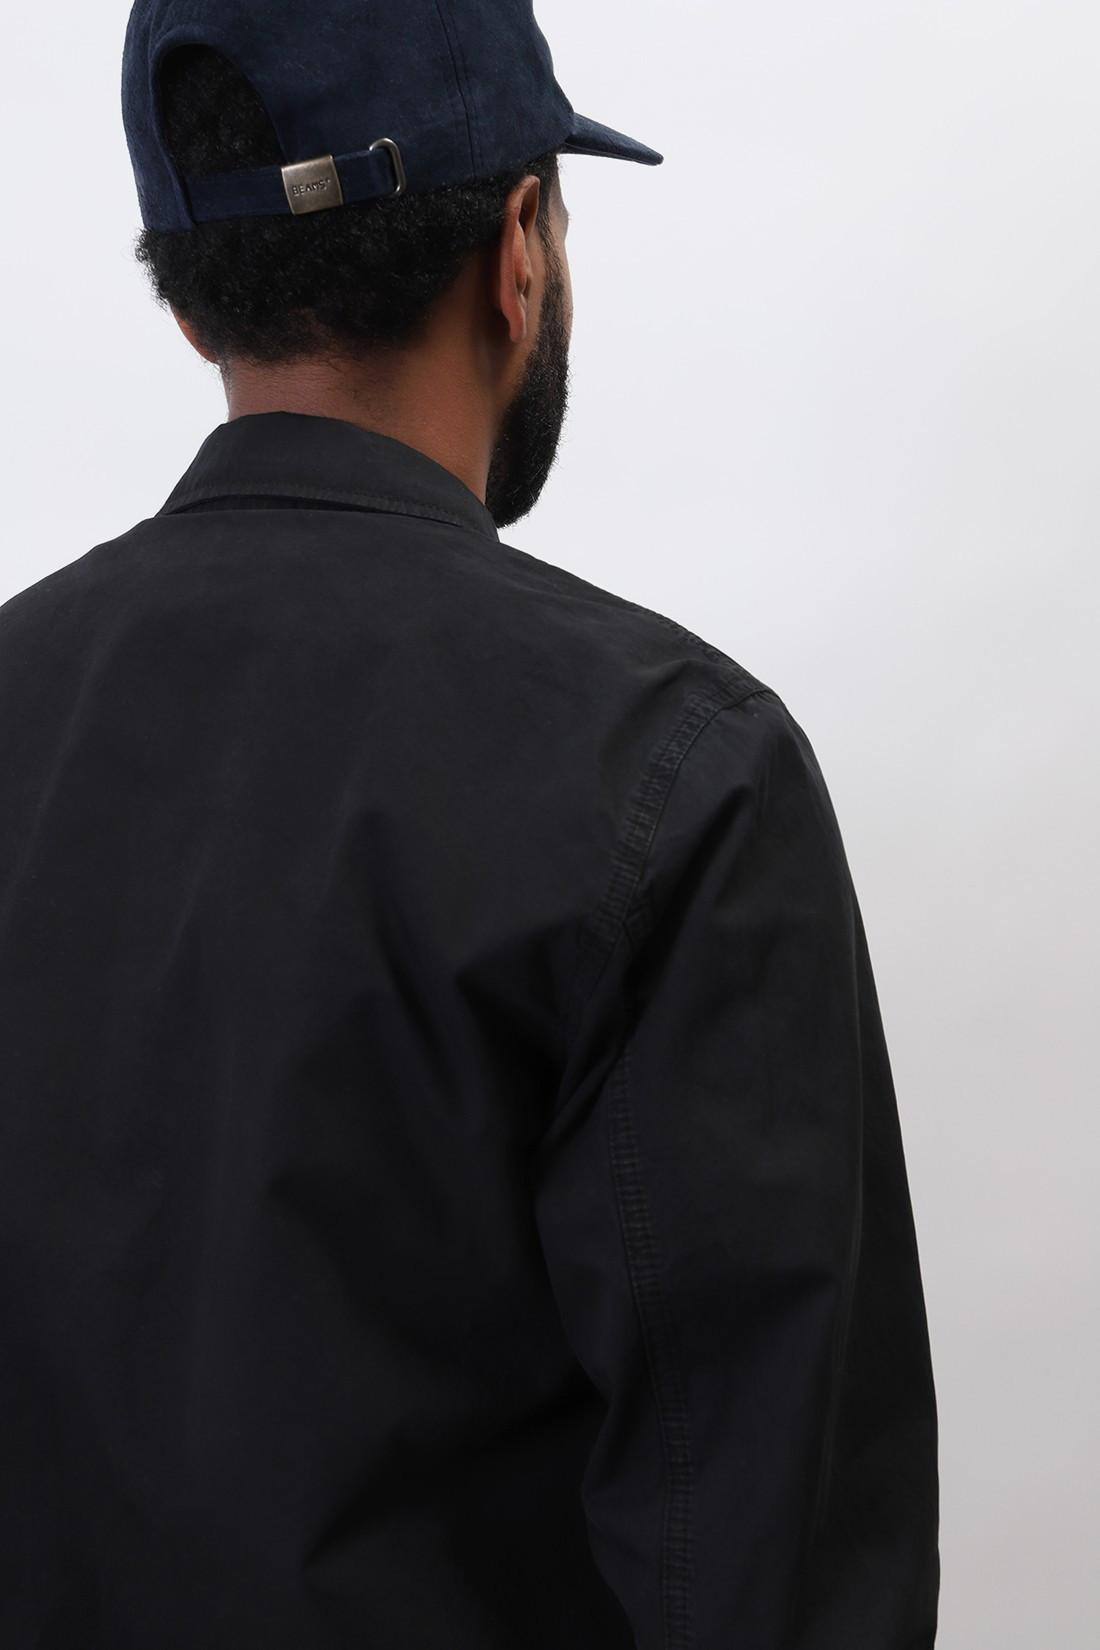 STONE ISLAND / 117wn overshirt v0129 Nero